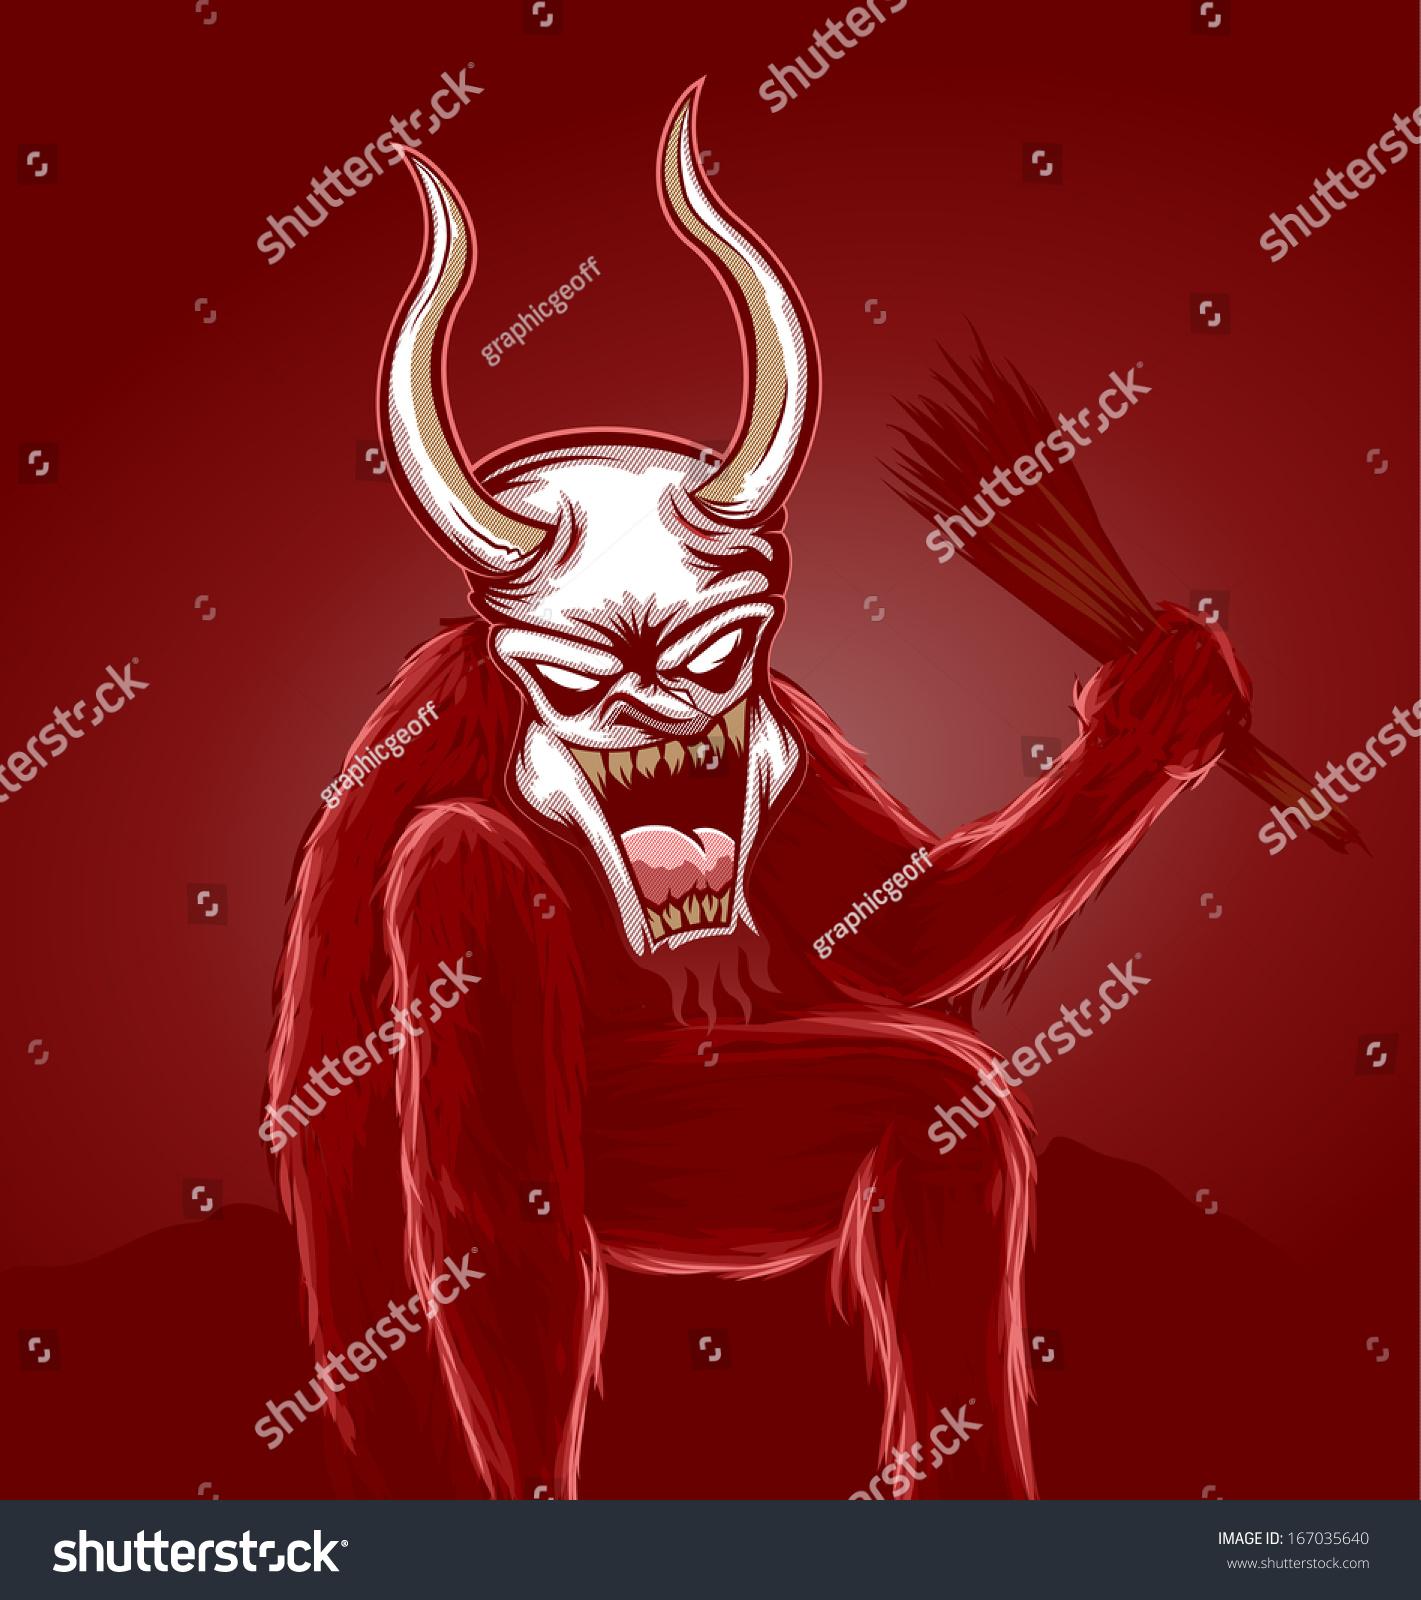 Scary Krampus Illustration Red Stock Illustration Royalty Free